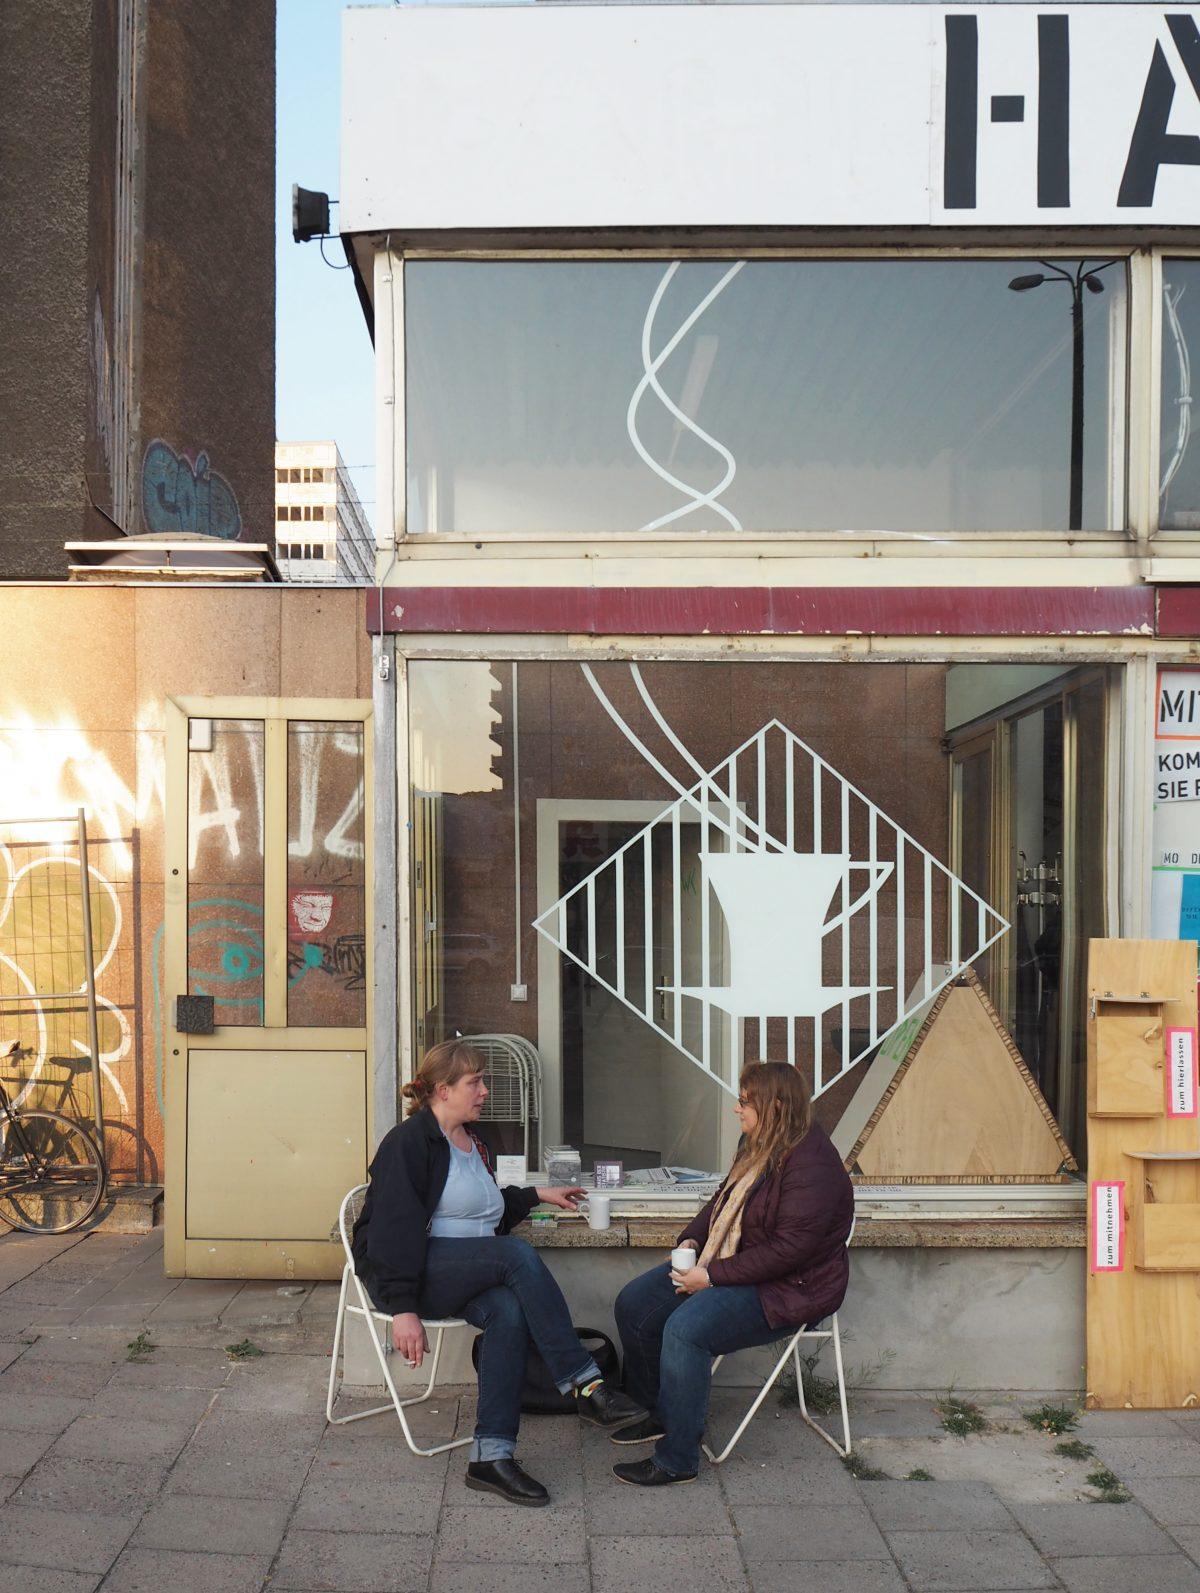 Café Statistik